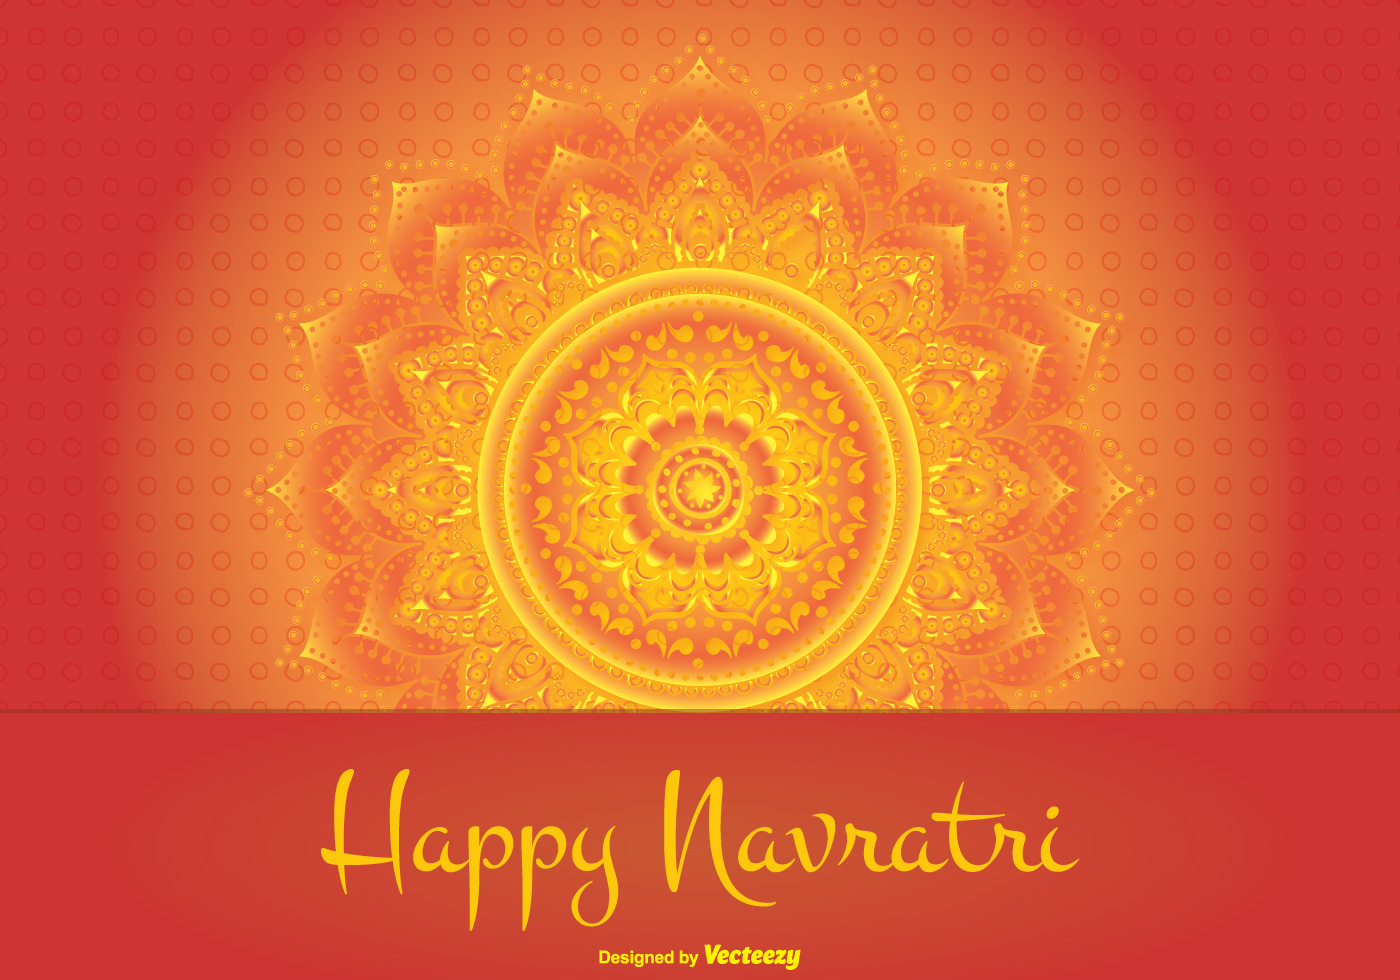 picture How to Celebrate Navratri